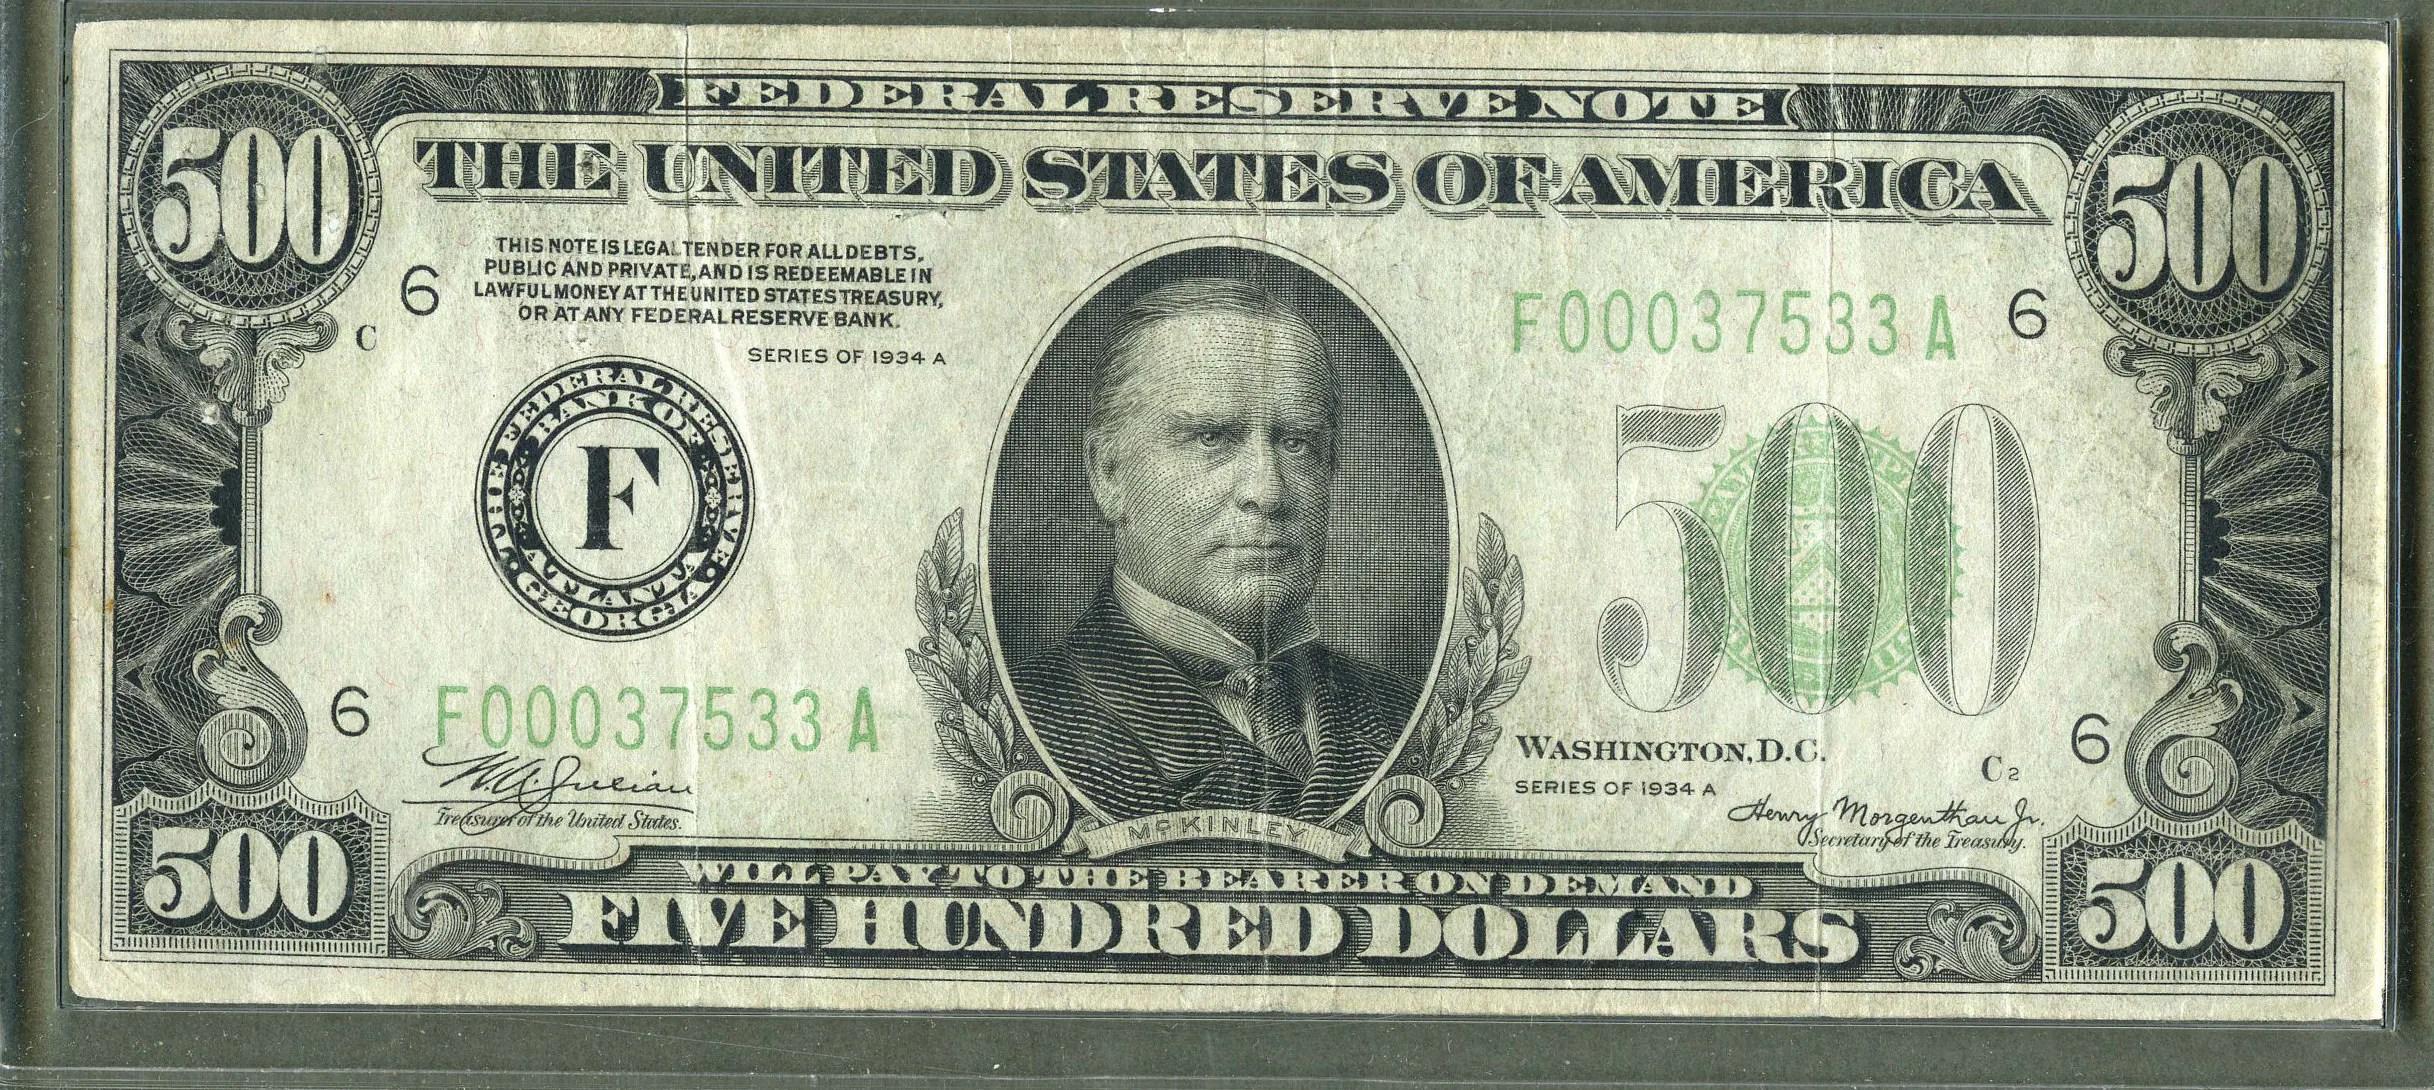 Five Hundred Dollar Bill Julian Morgenthau Circulated